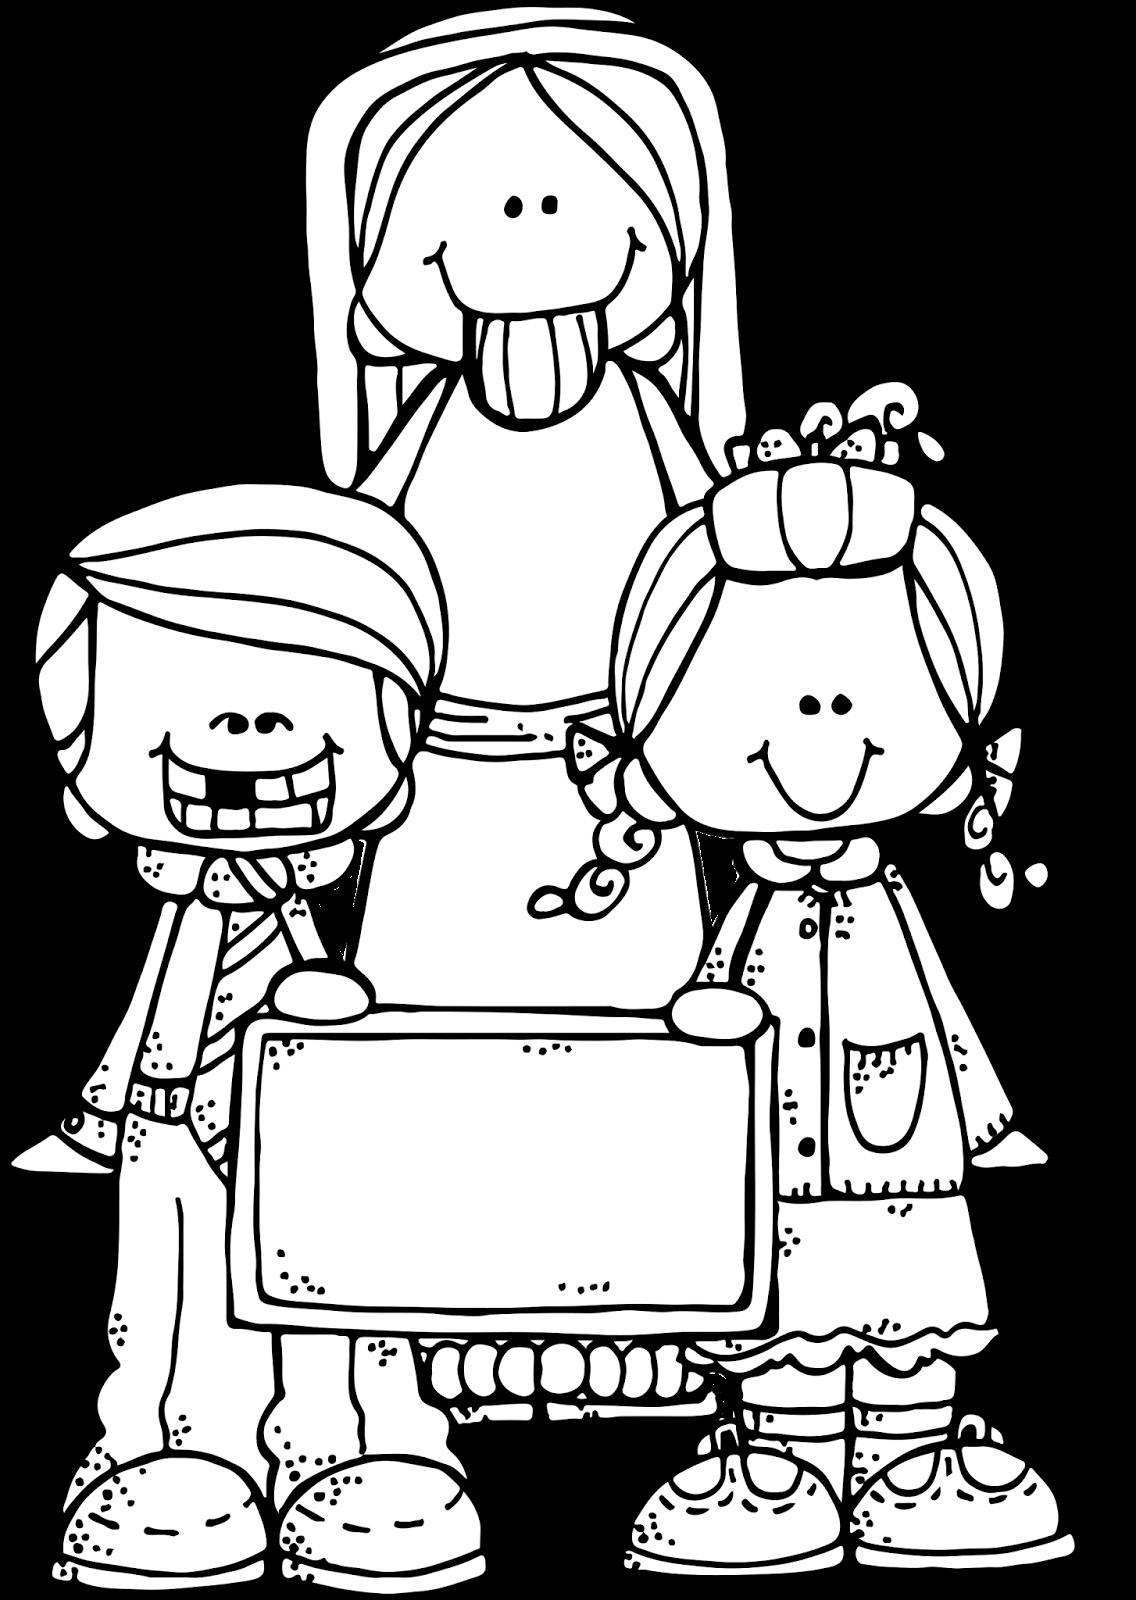 Melonheadz Lds Illustrating Primary Theme Image